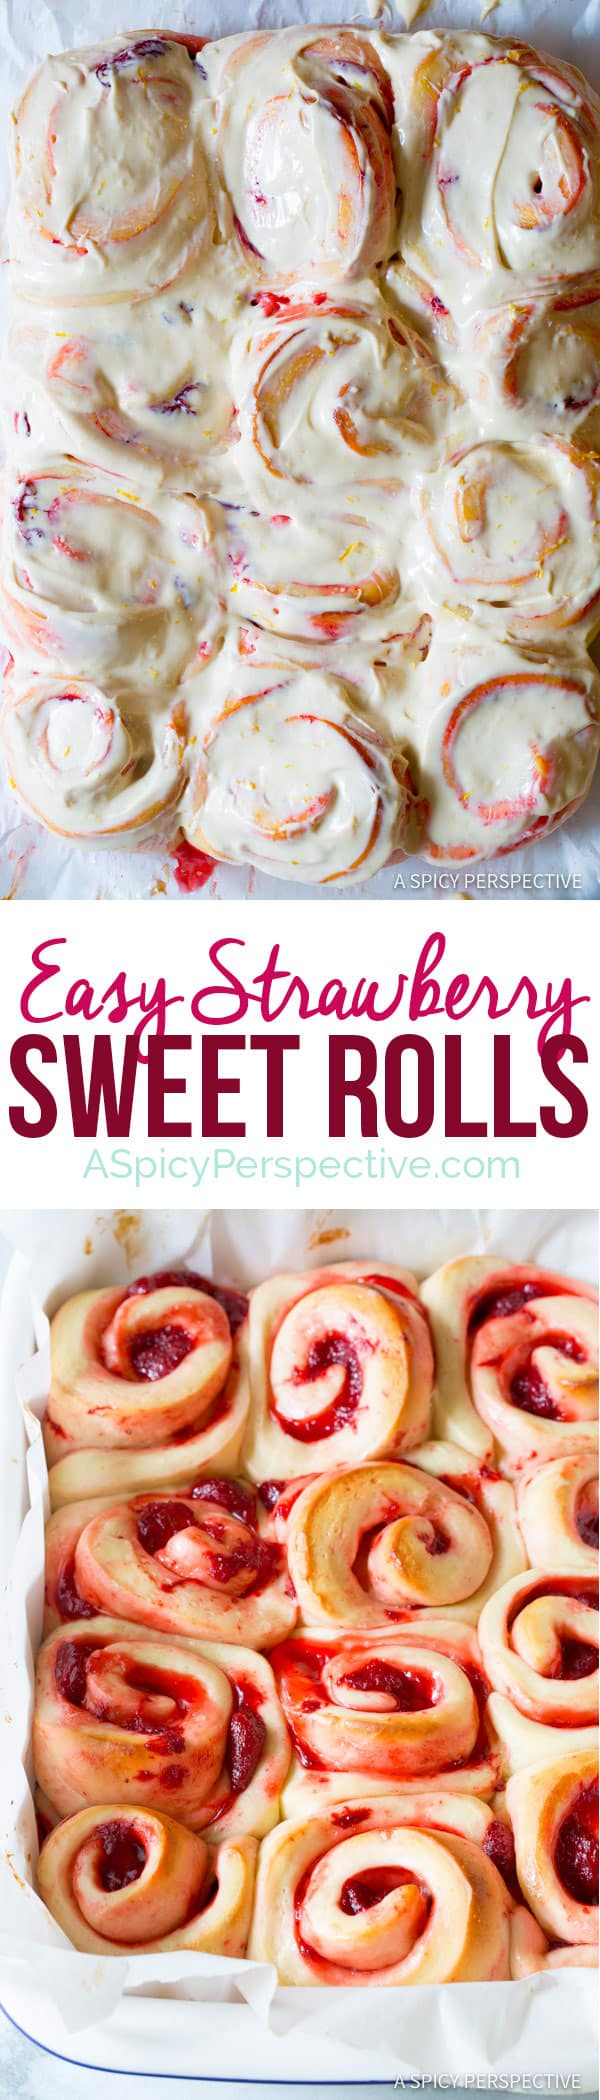 The Best Strawberry Sweet Rolls Recipe | ASpicyPerspective.com